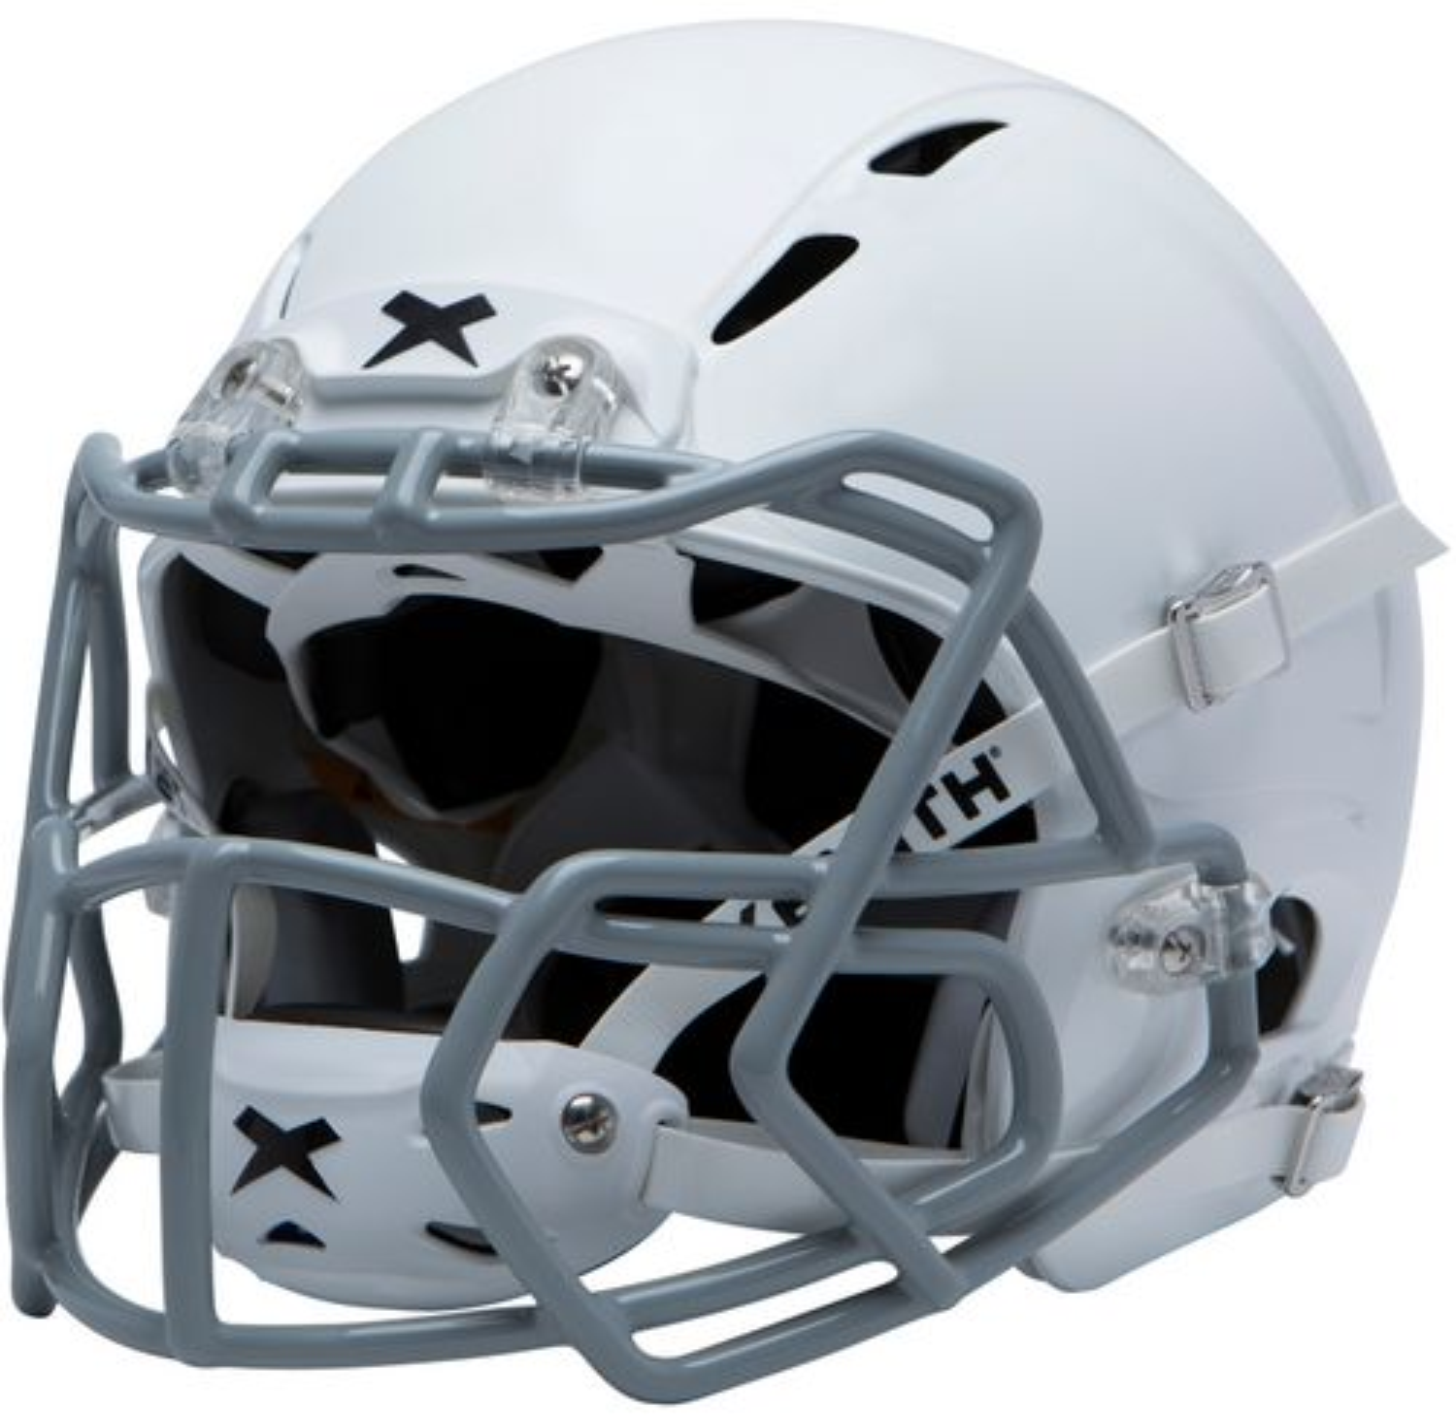 Football Helmets & Masks